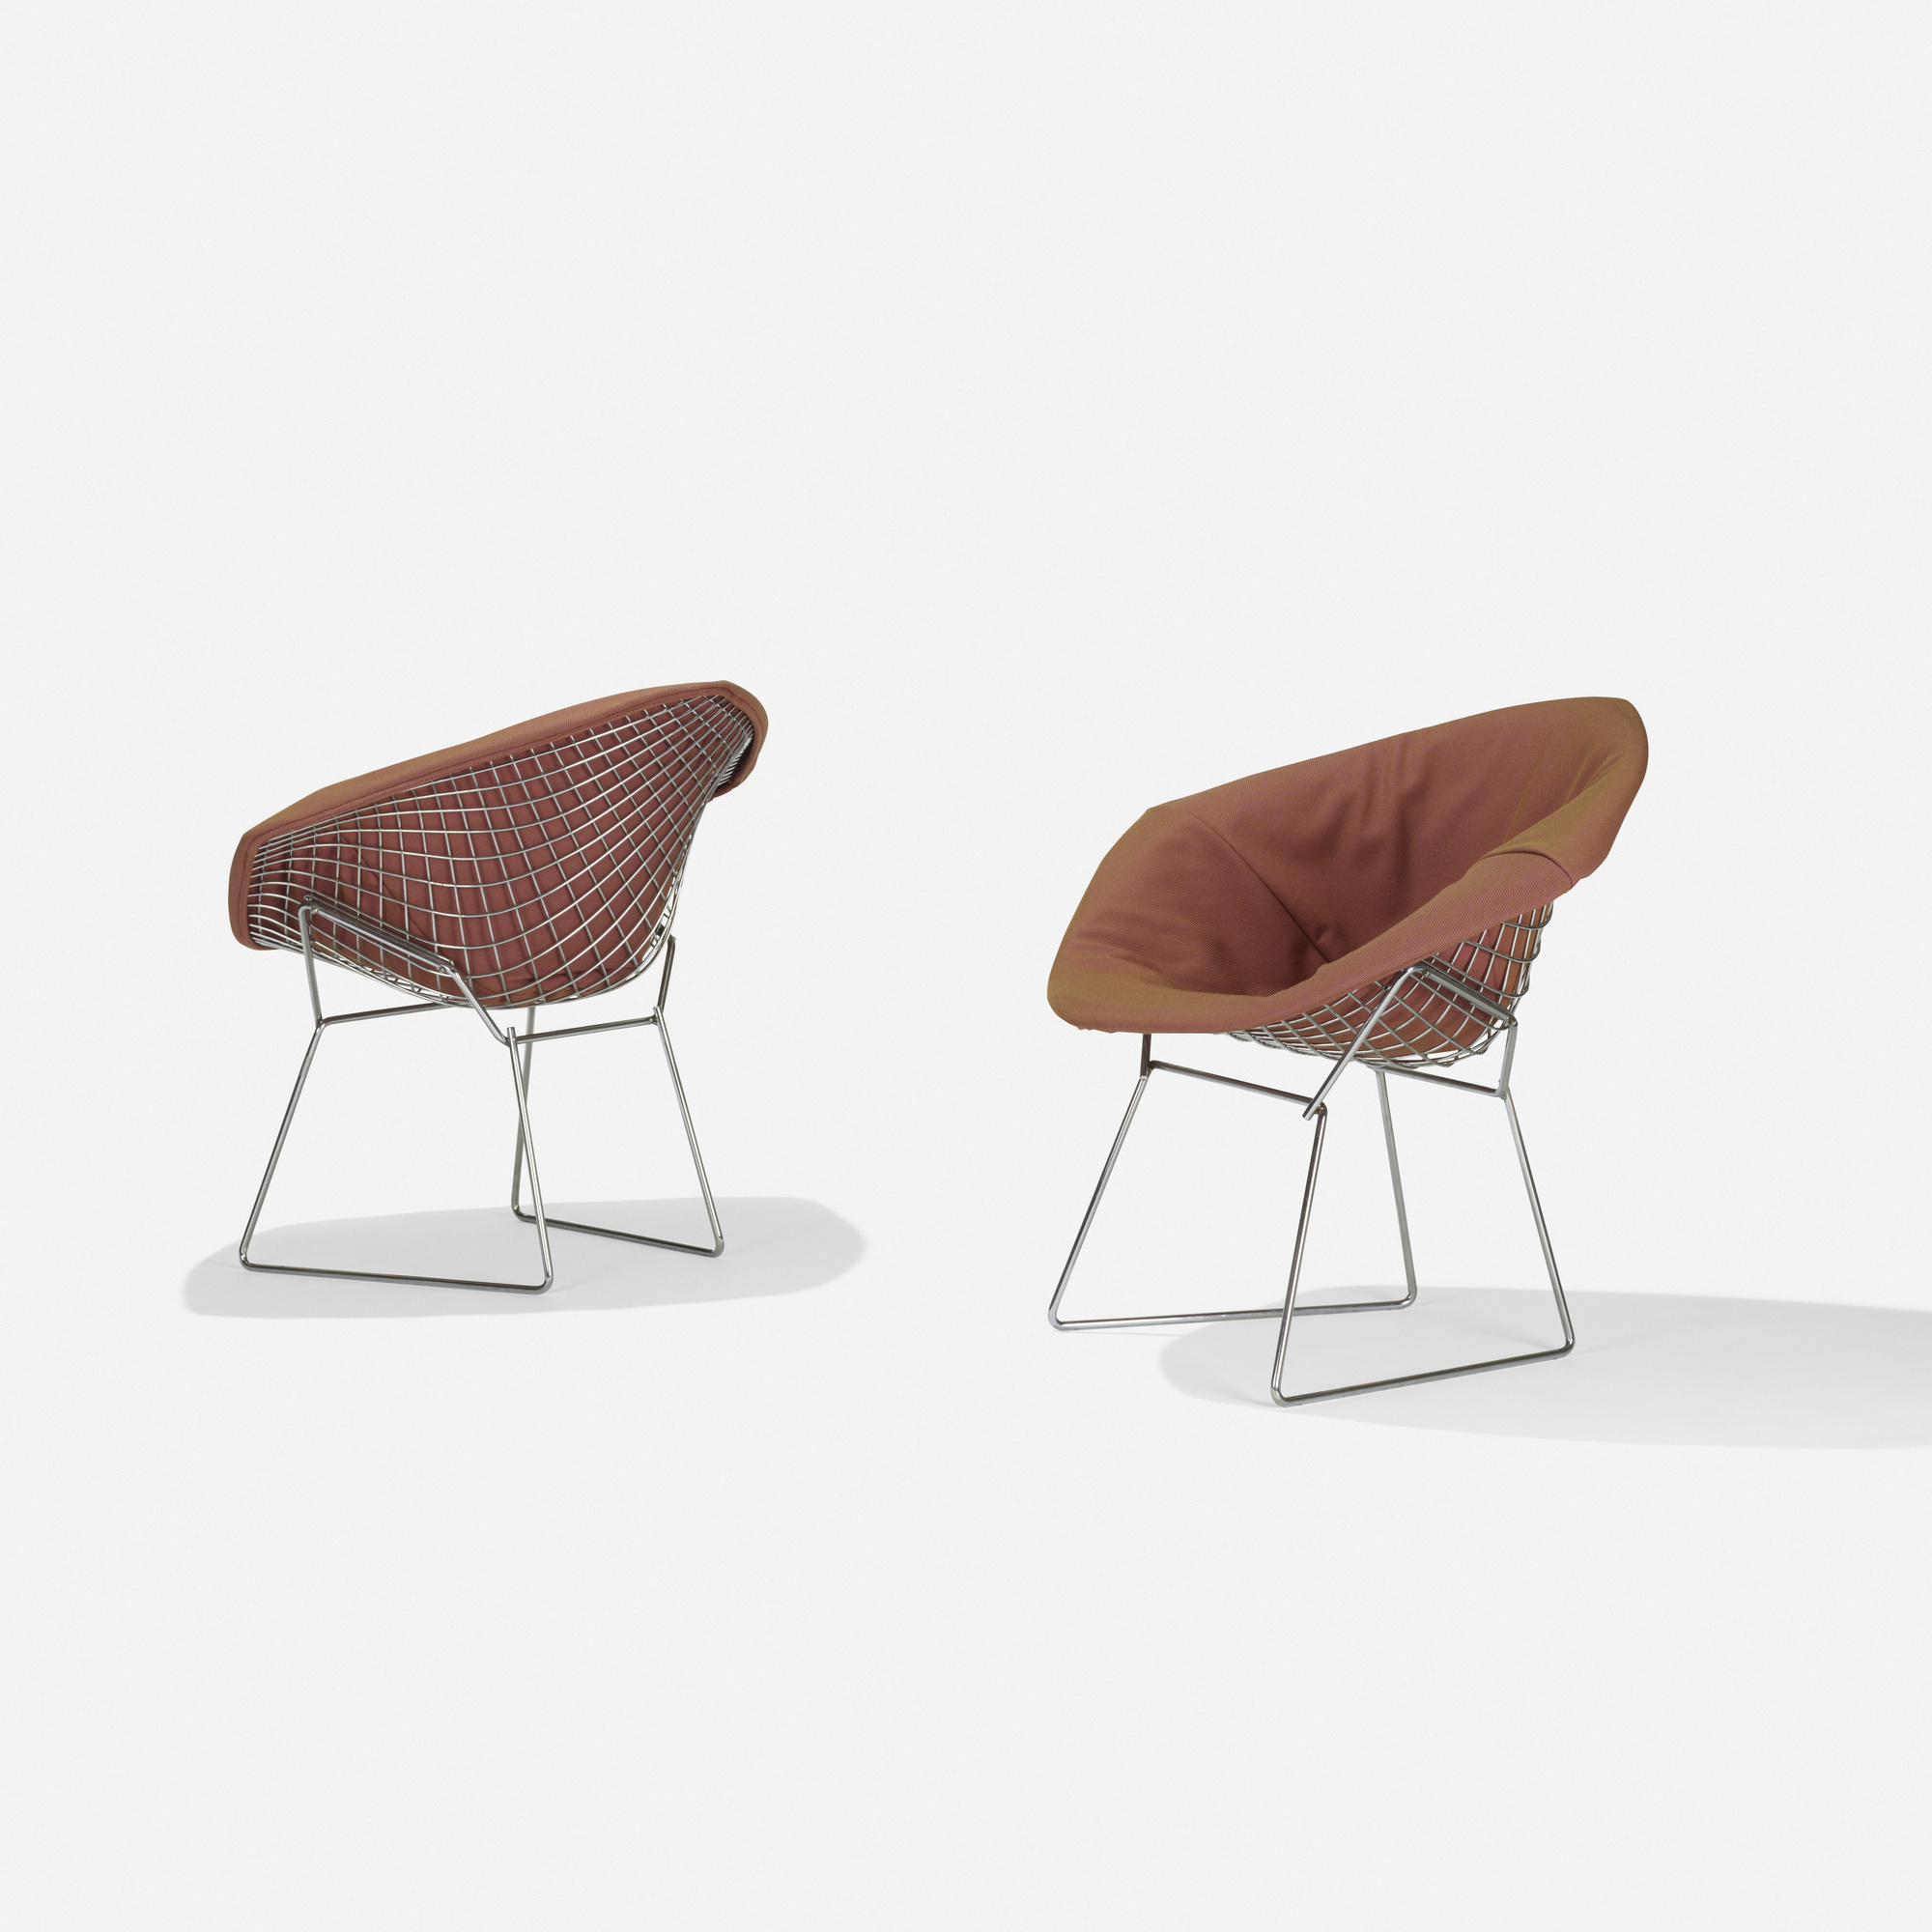 Ordinaire 193: Harry Bertoia / Diamond Chairs, Pair (1 Of 2) ...